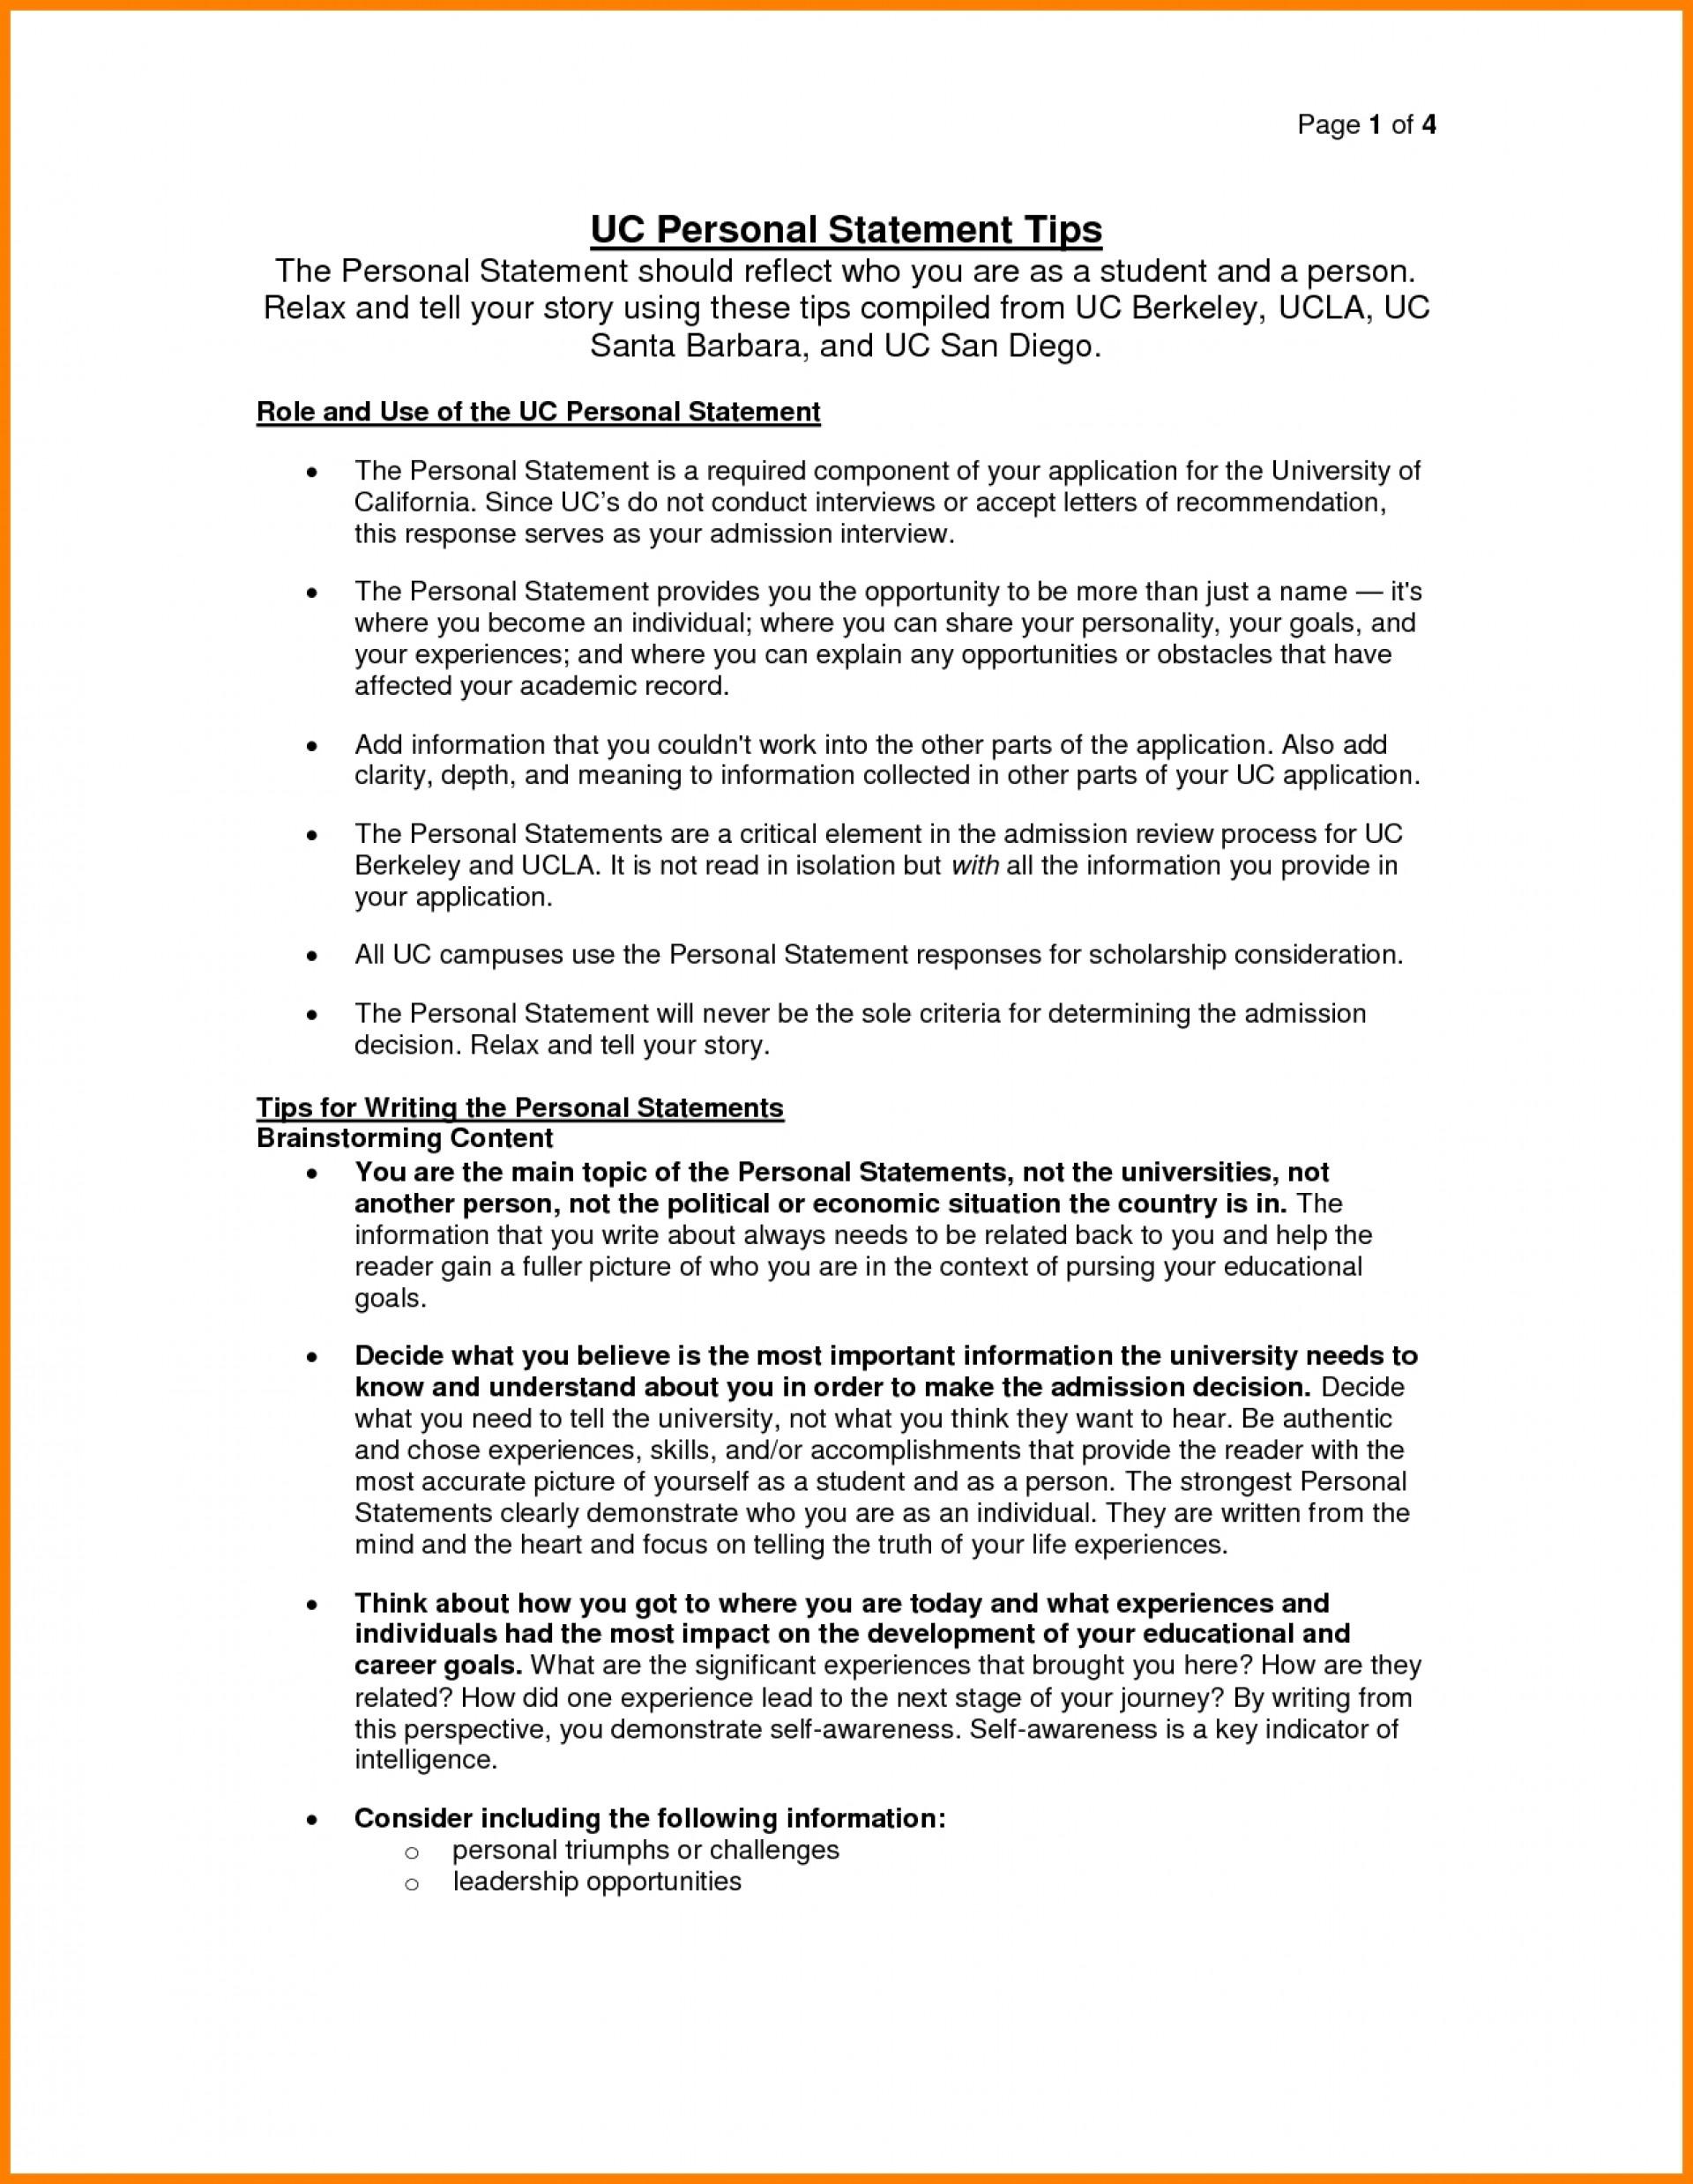 Professional development essay for teachers